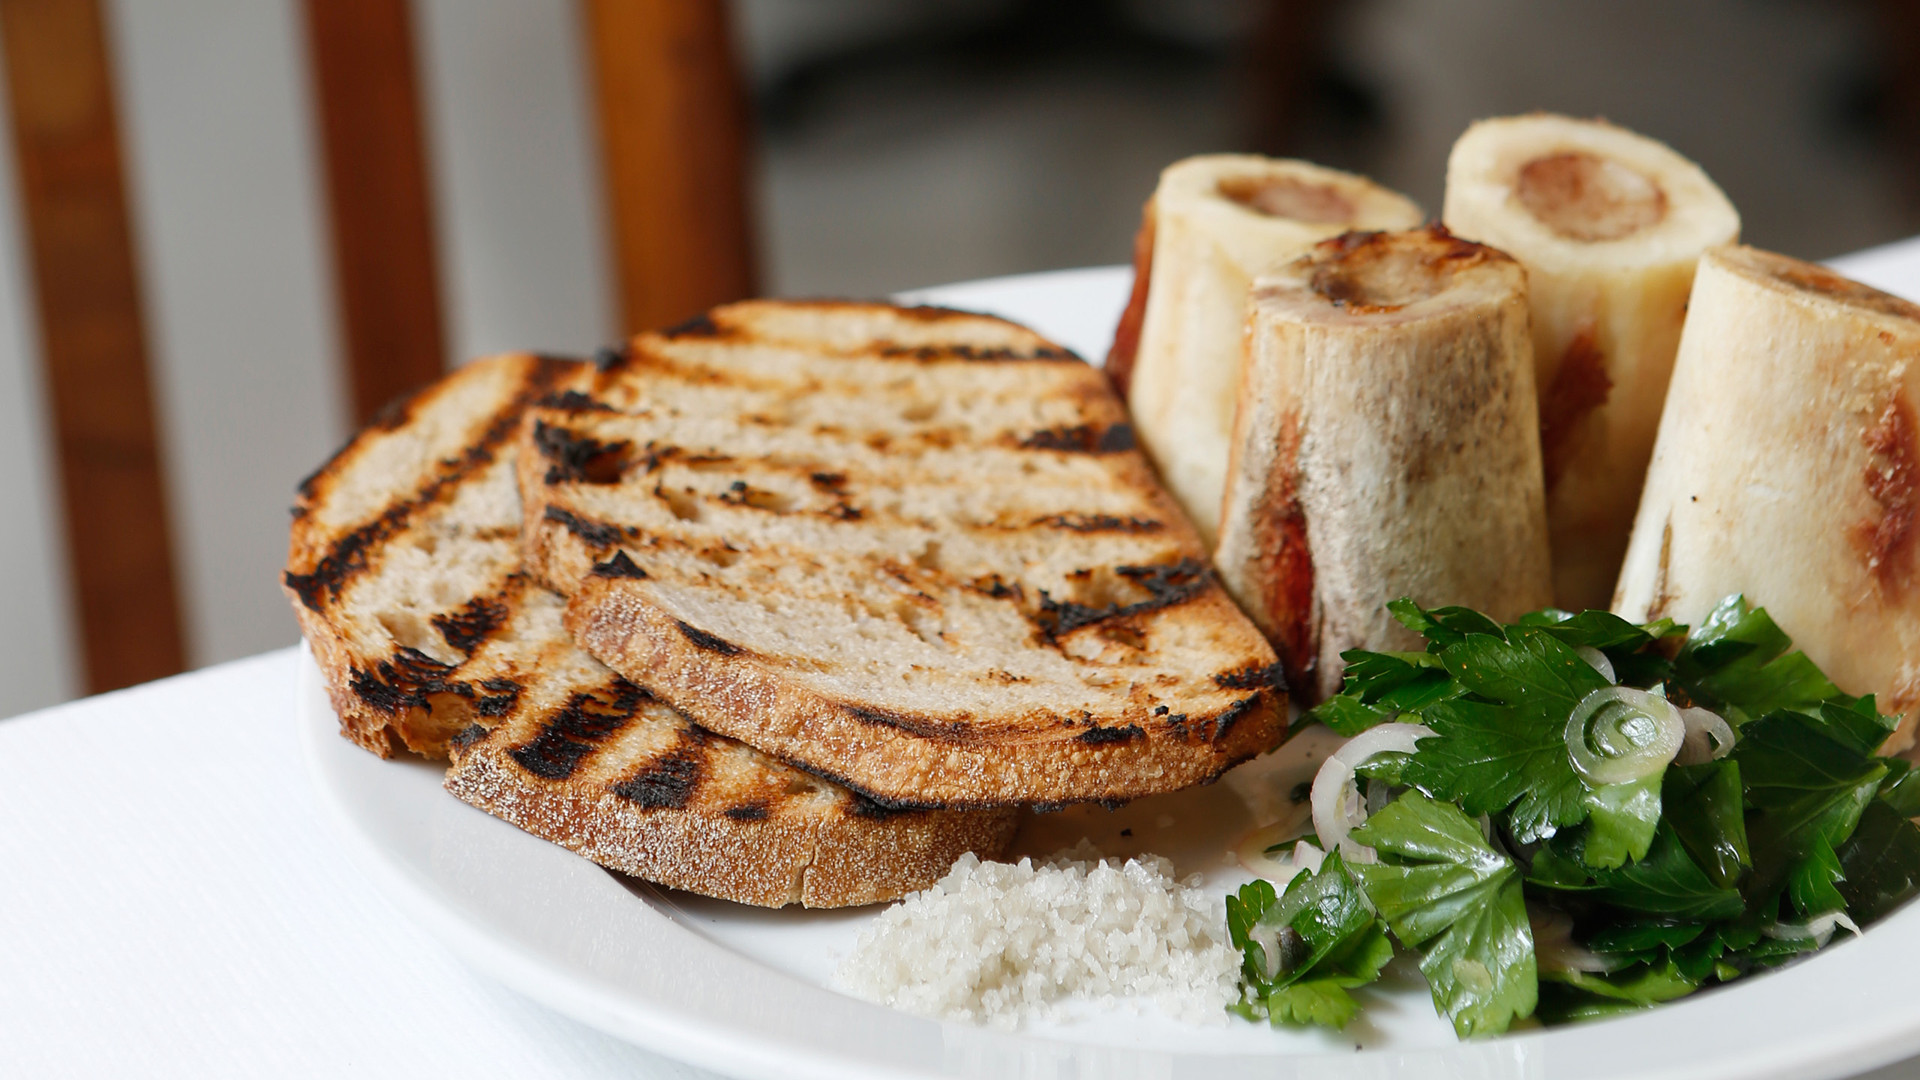 London's best nose-to-tail restaurants – St. John